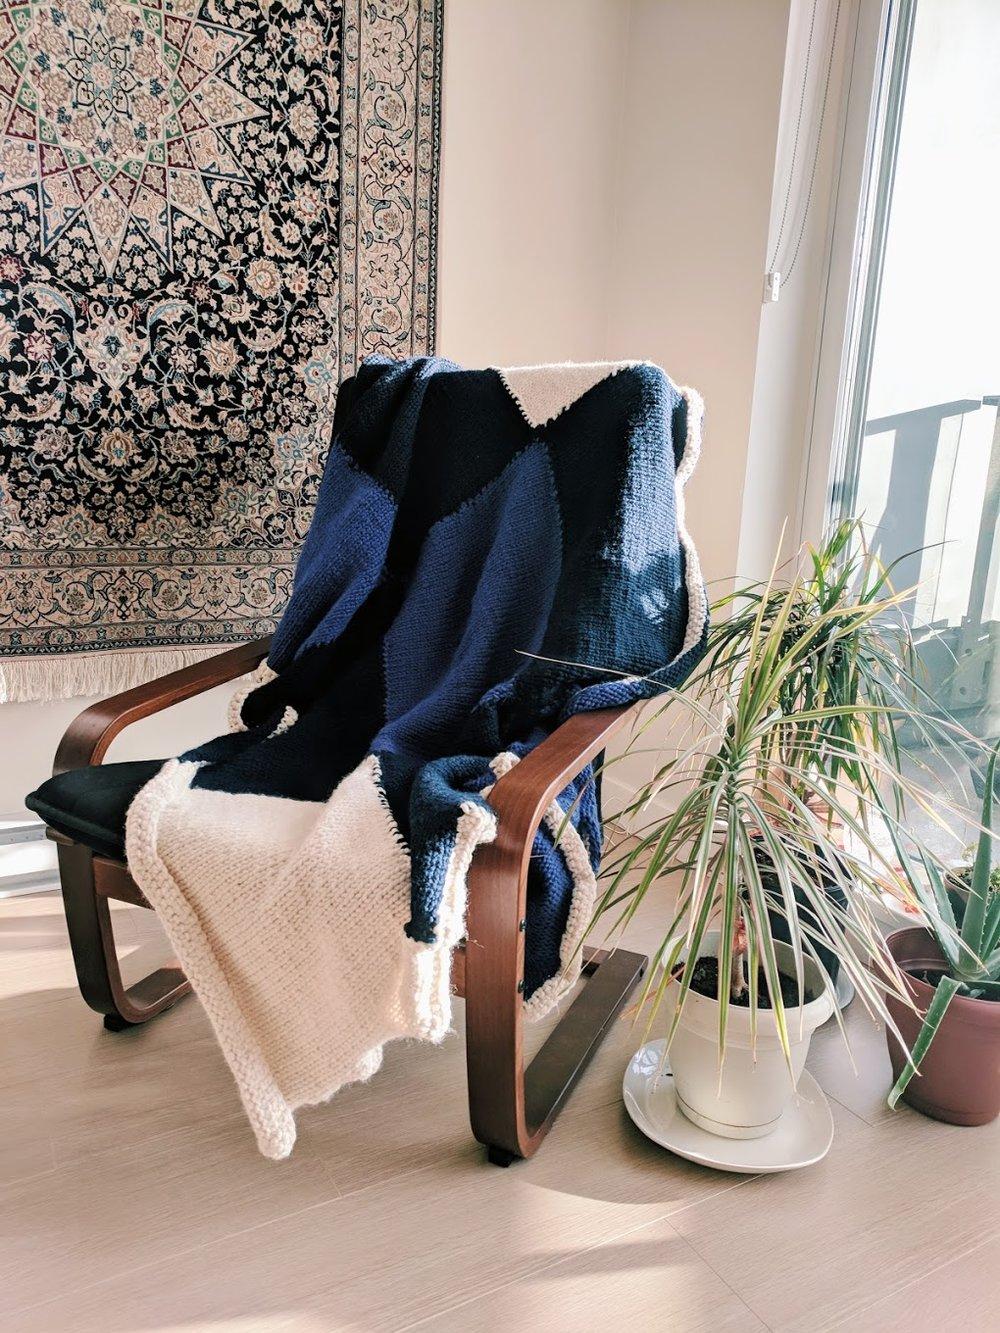 block knit blanket on chair.jpg